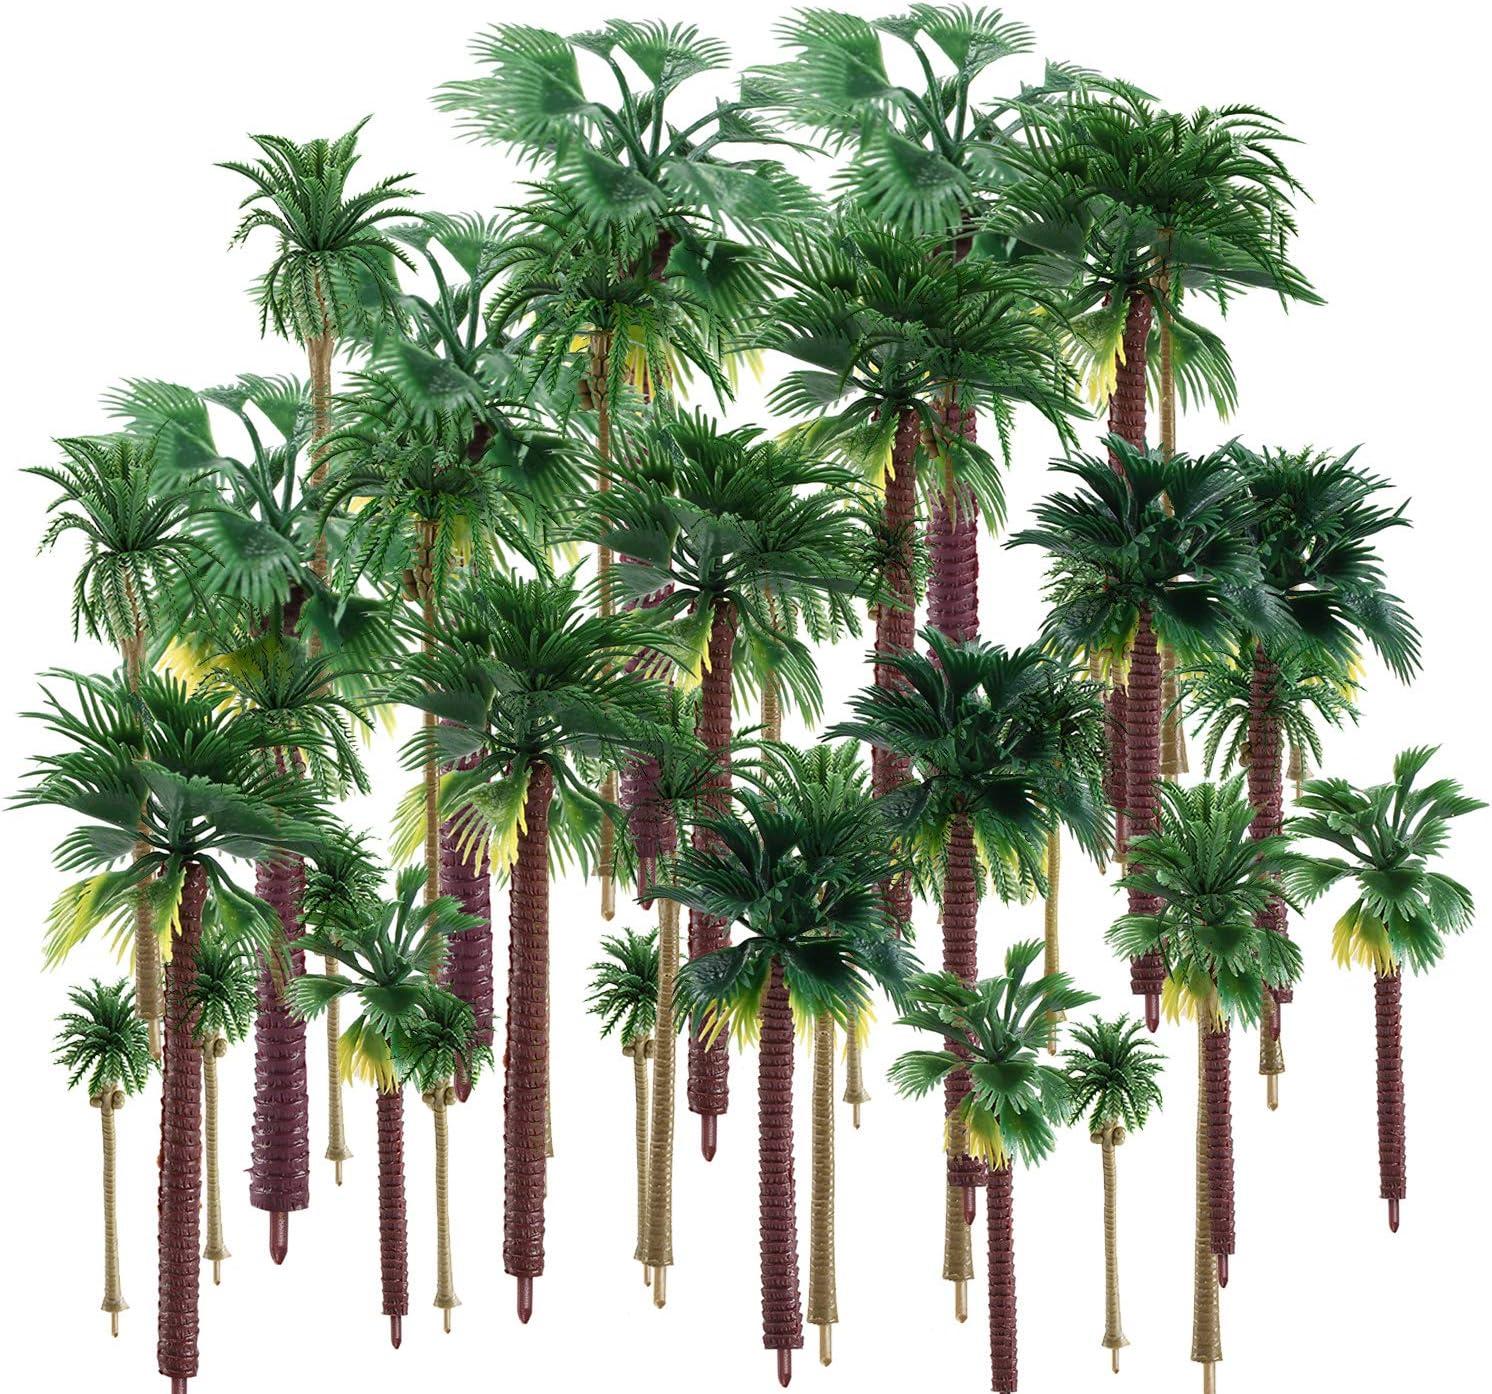 trounistro 30 Pieces Model Trees Model Coconut Palm Tree Train Scenery Miniature Landscape Scenery Diorama Models Architecture Trees